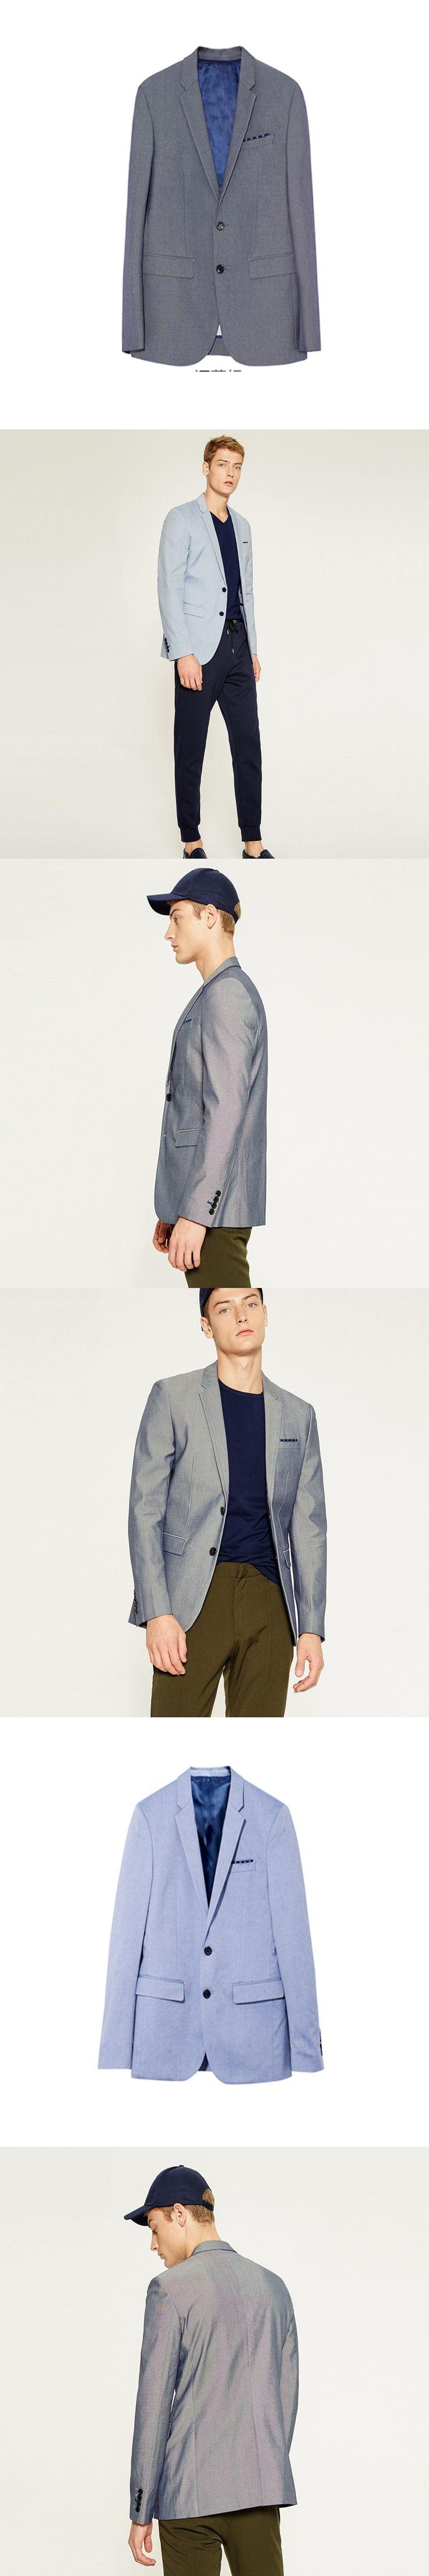 Fashion Casual Suit Jacket Grey/Light Blue Blazer Masculino Slim Fit Classic Men Coat  Formal Solid Color Male Suits Jacket 2018